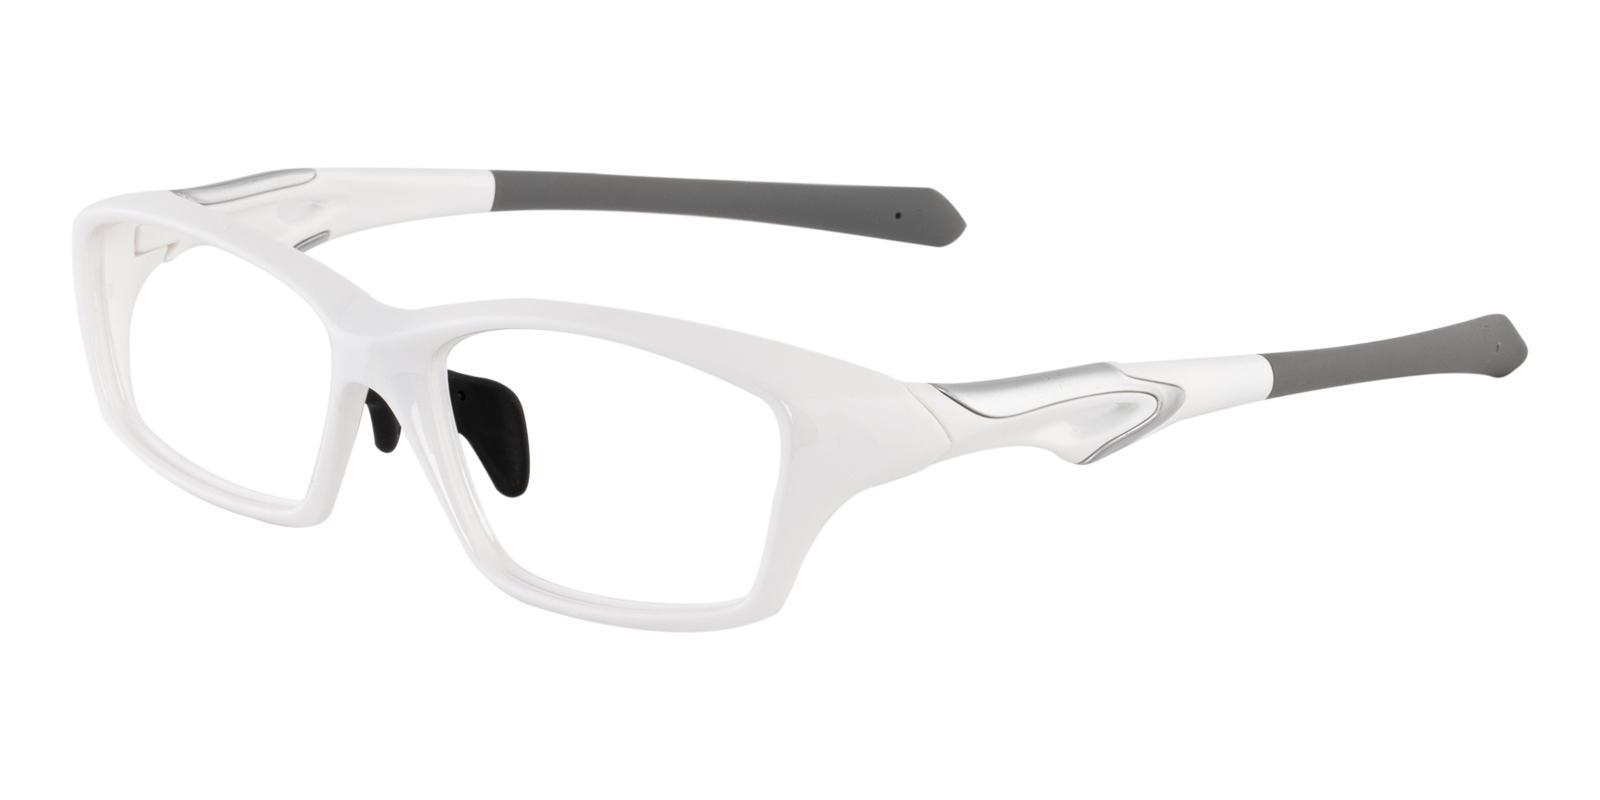 Clementine White TR NosePads , SportsGlasses , SpringHinges Frames from ABBE Glasses